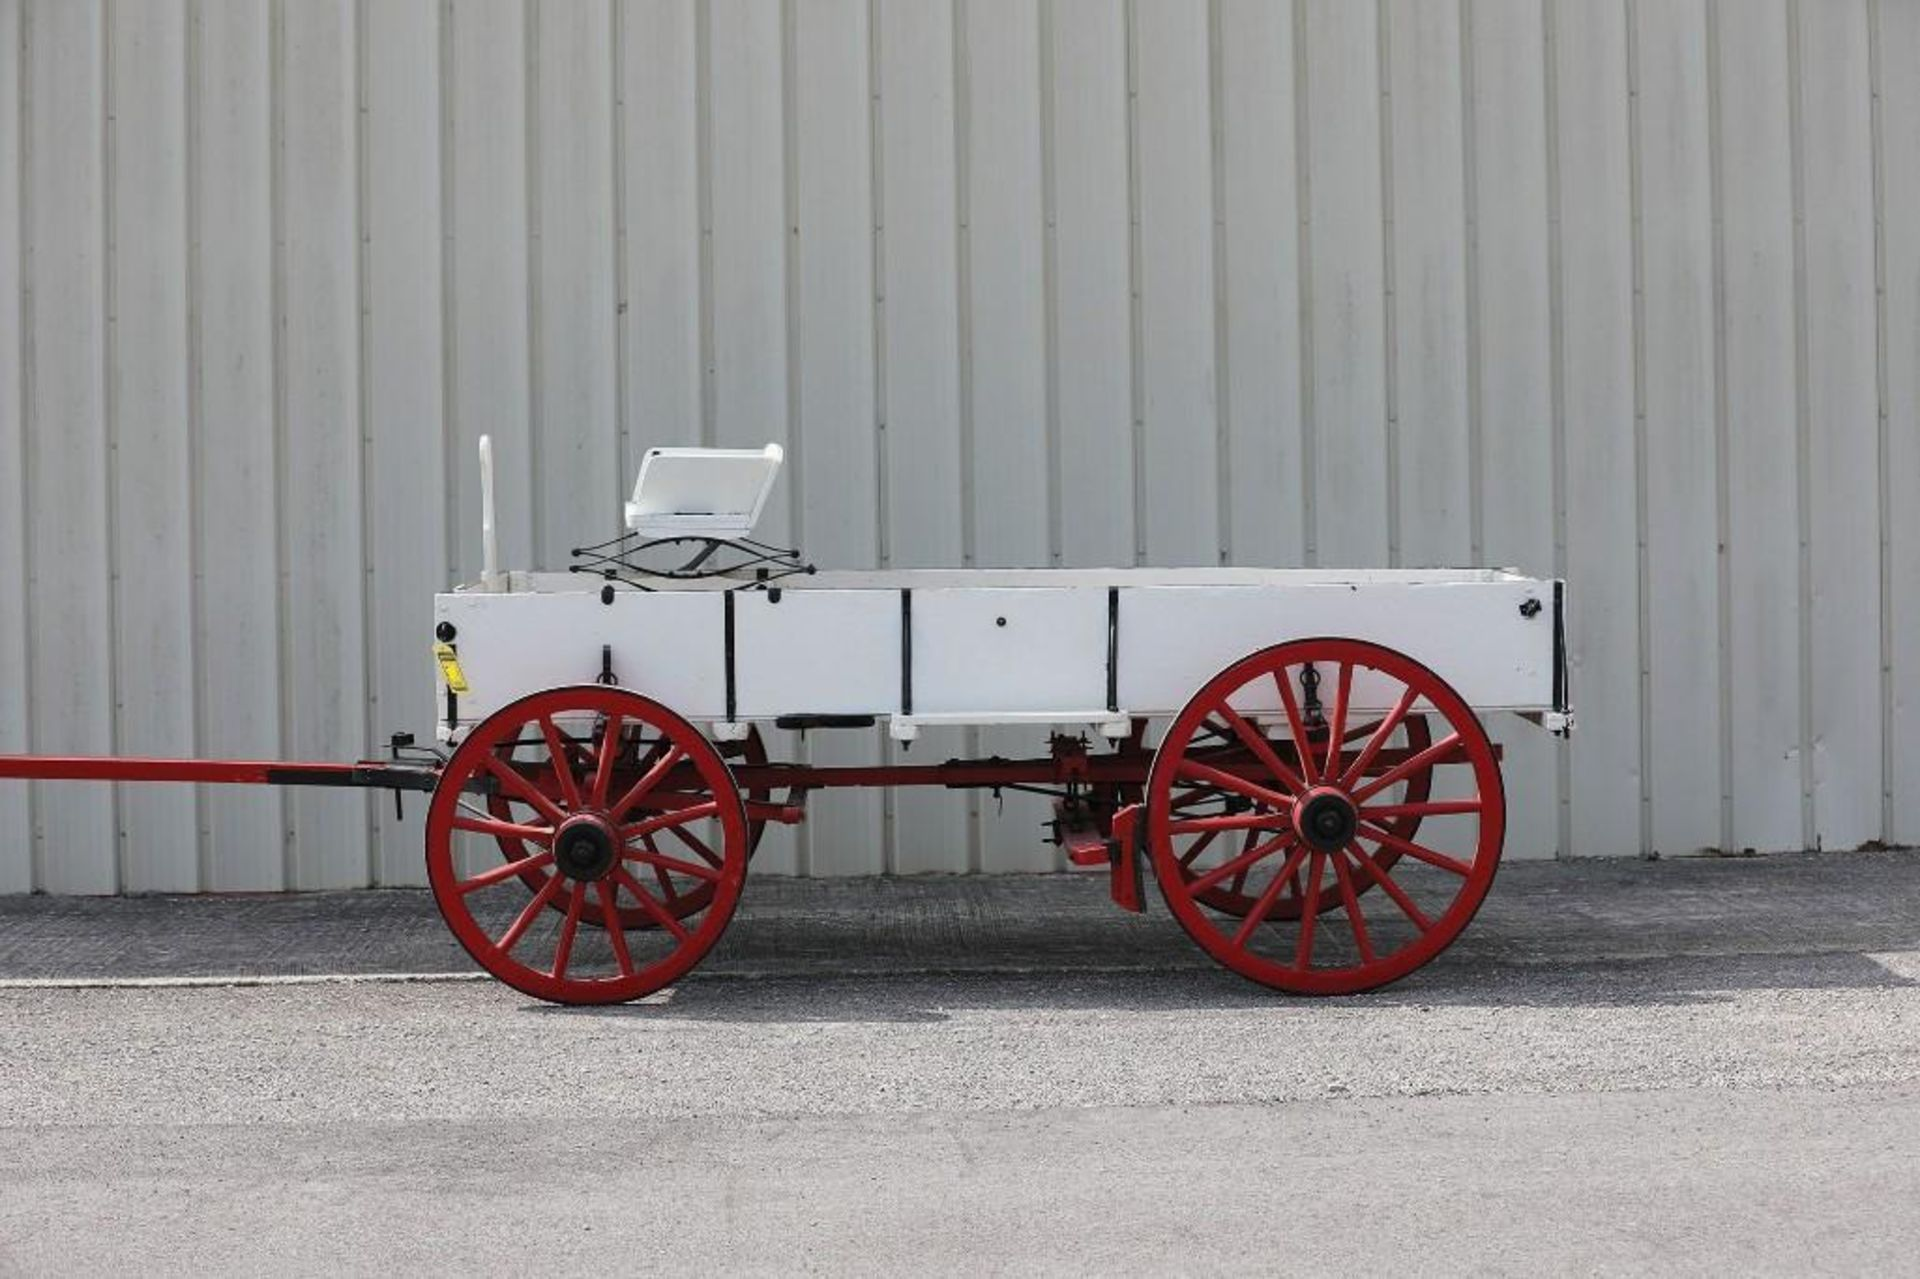 OWENSBORO Box Bed Farm Wagon, Hand Brake, Seat will sell separate